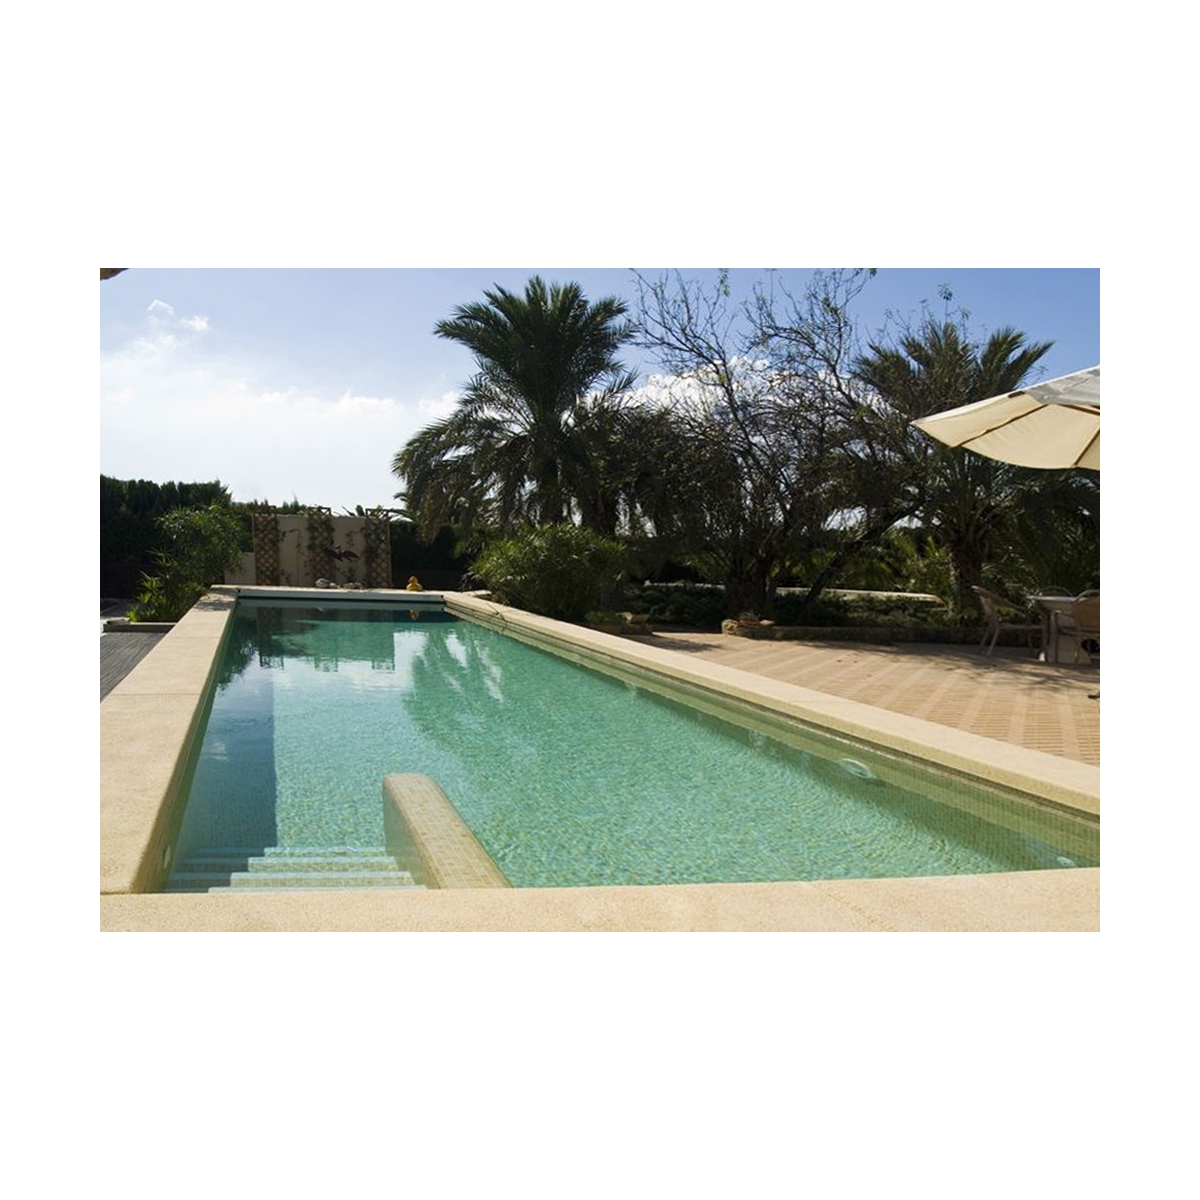 Gresite para piscina color beige niebla (m2) barato